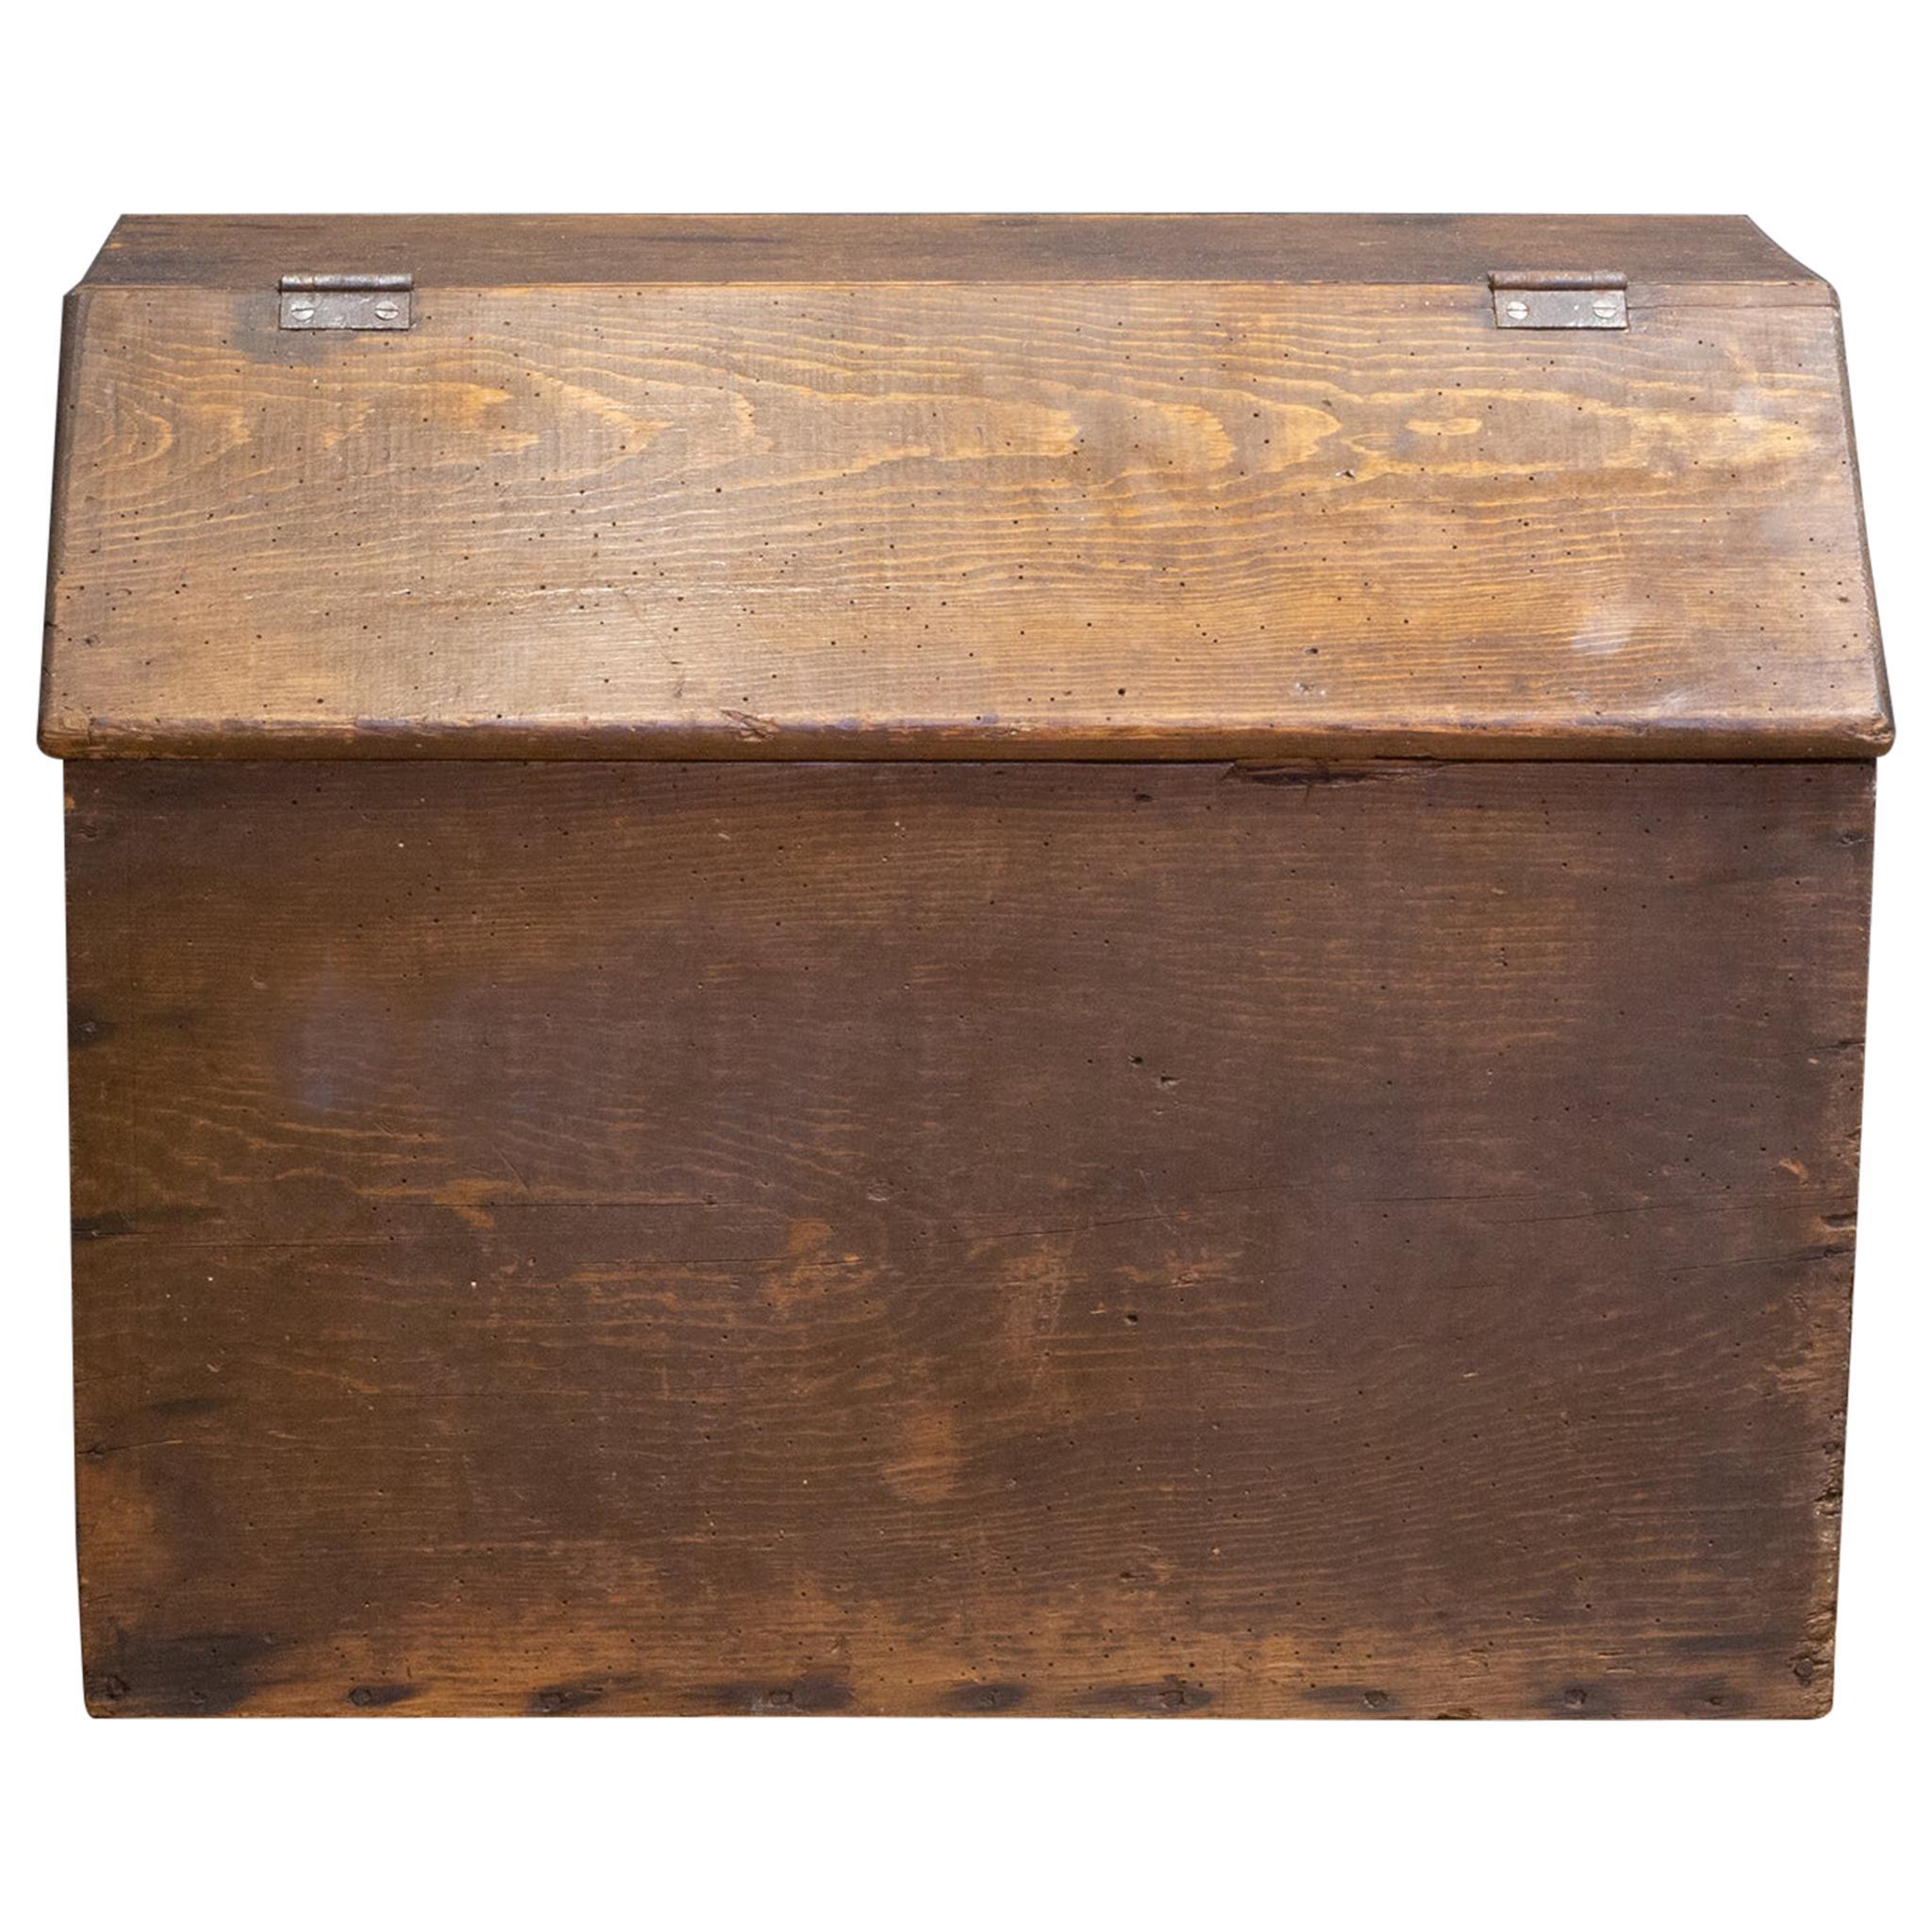 Handmade Rustic Lidded Wooden Box/Storage Bin, C.1940